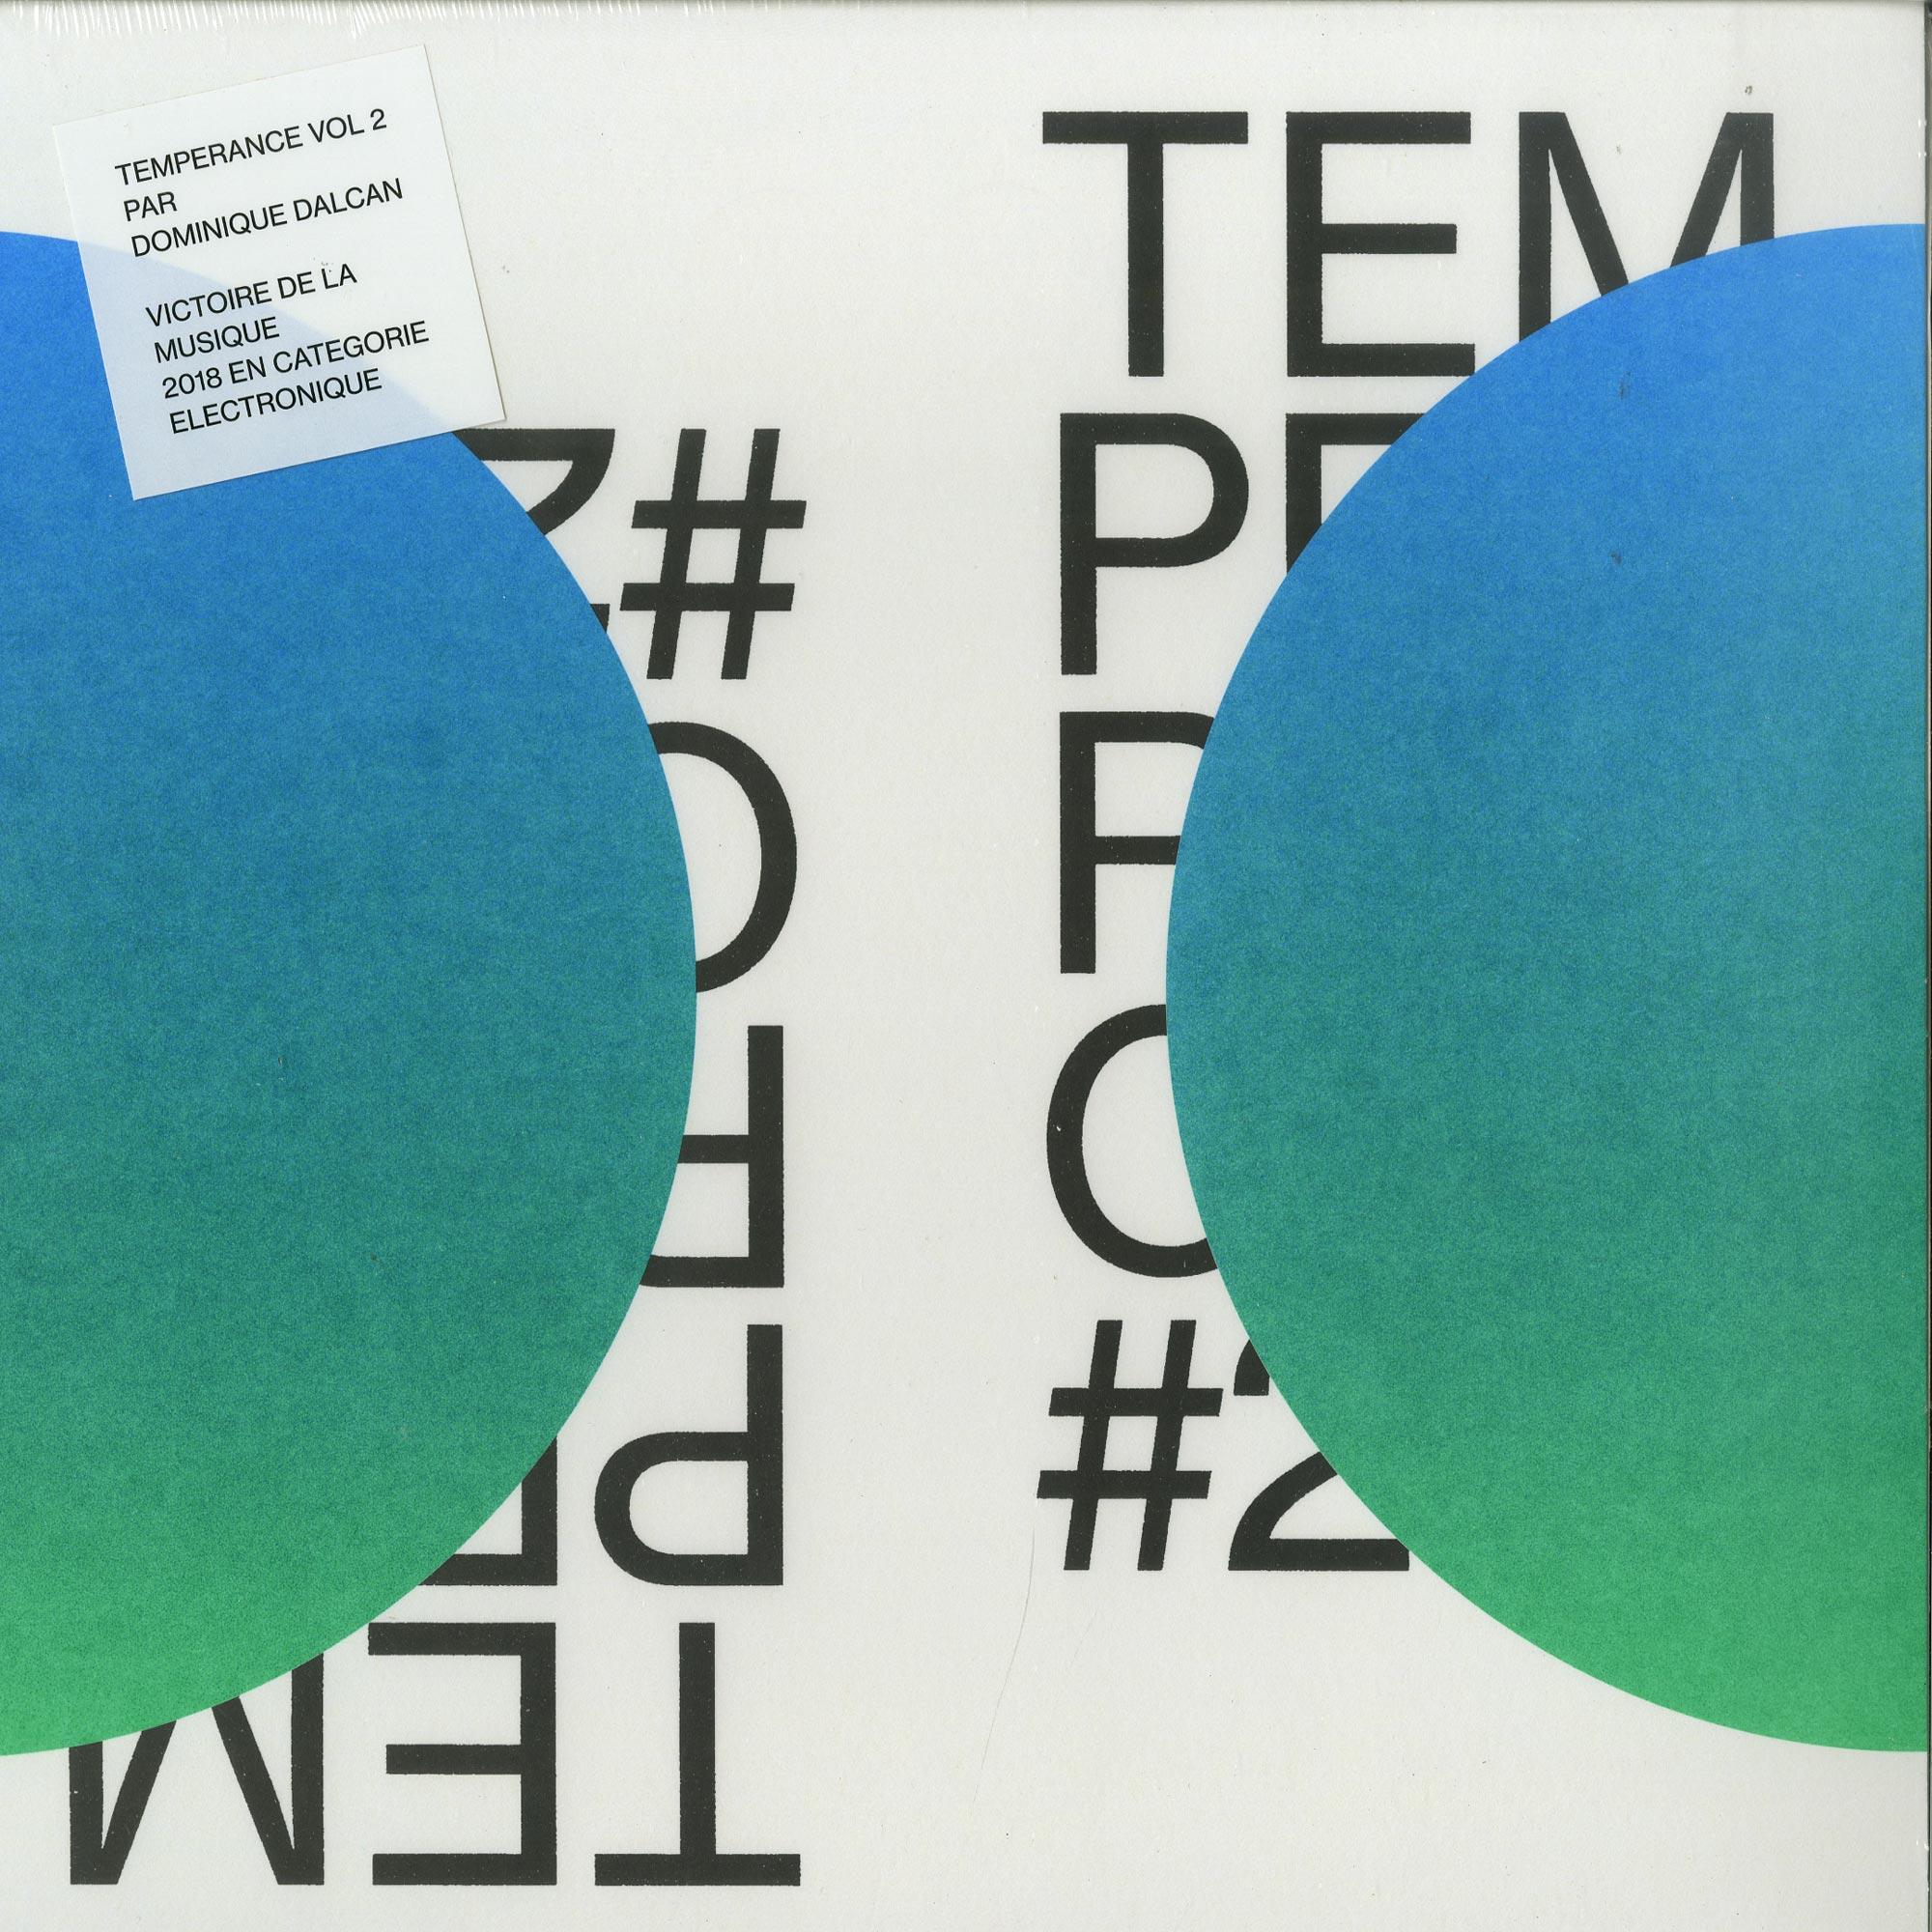 Temperance - TEMPERANCE VOL. 2